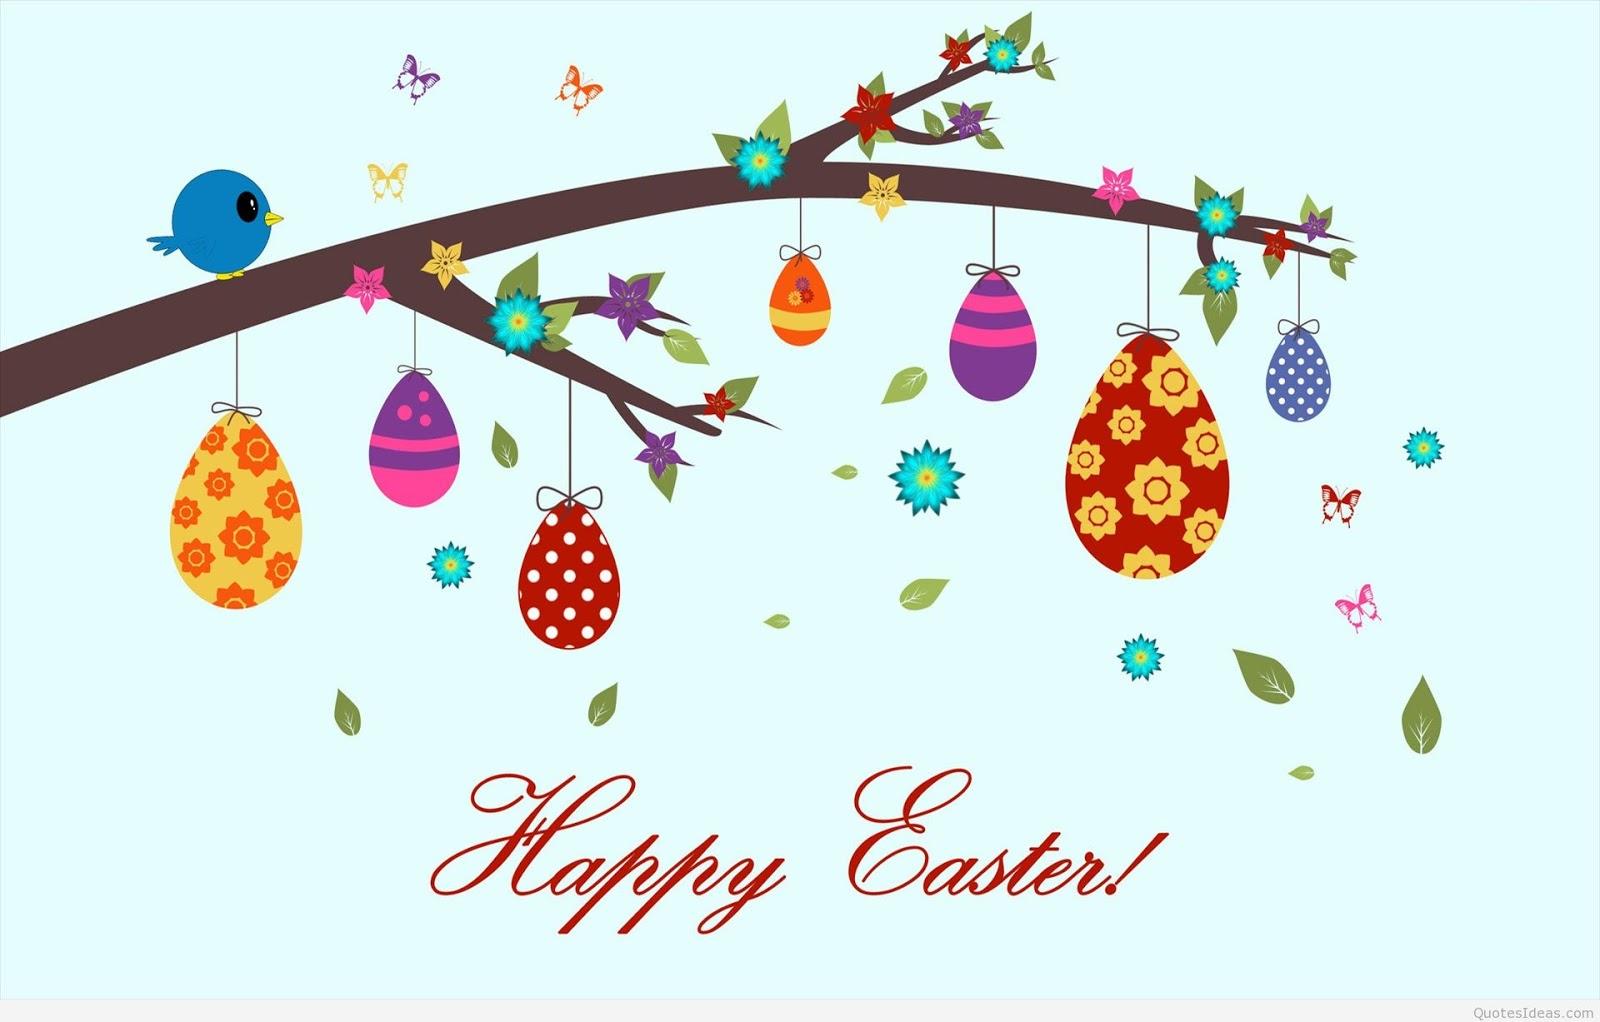 50 Happy Easter Egg Images